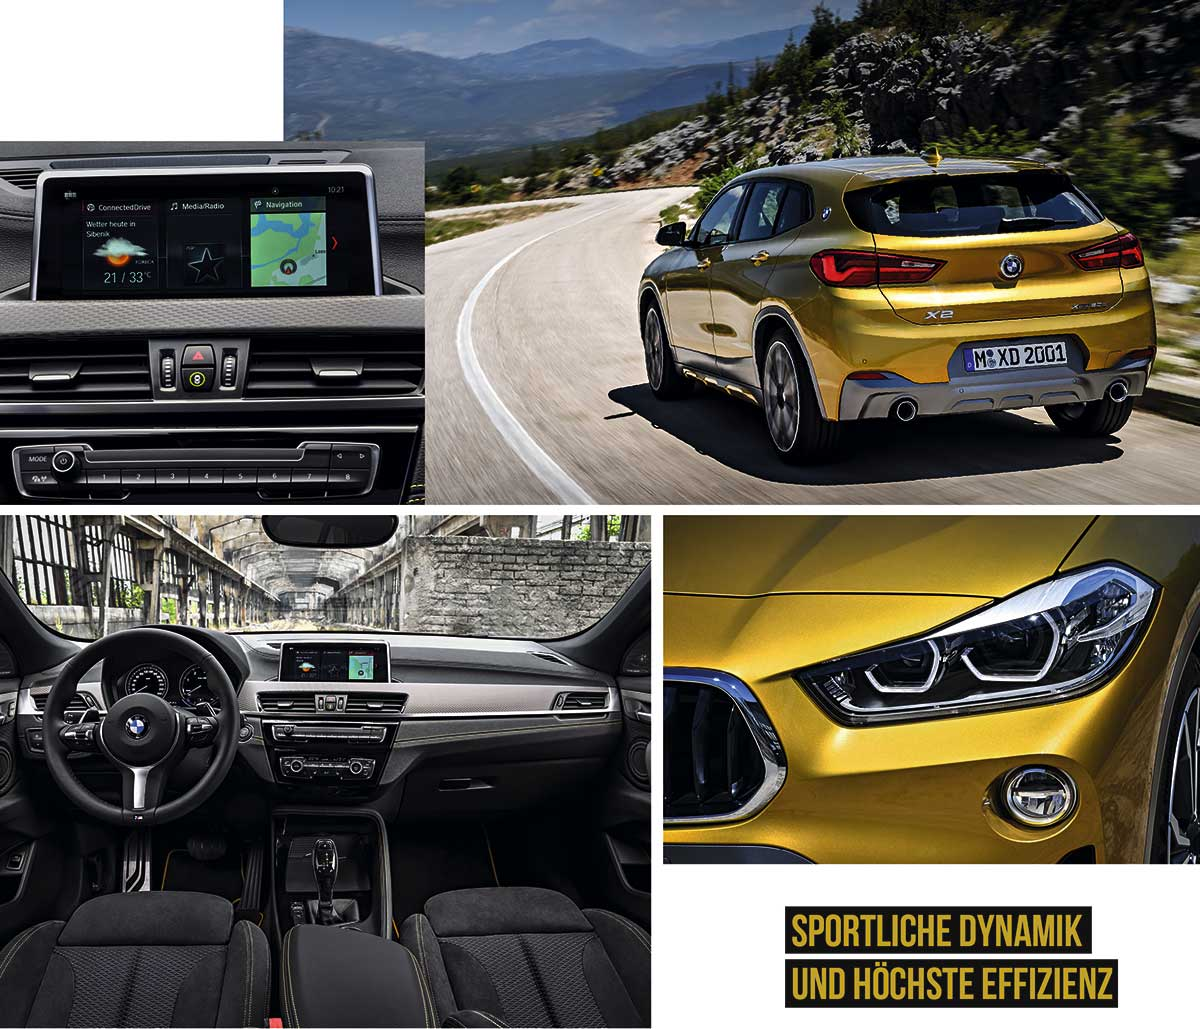 BMW_X2_Details